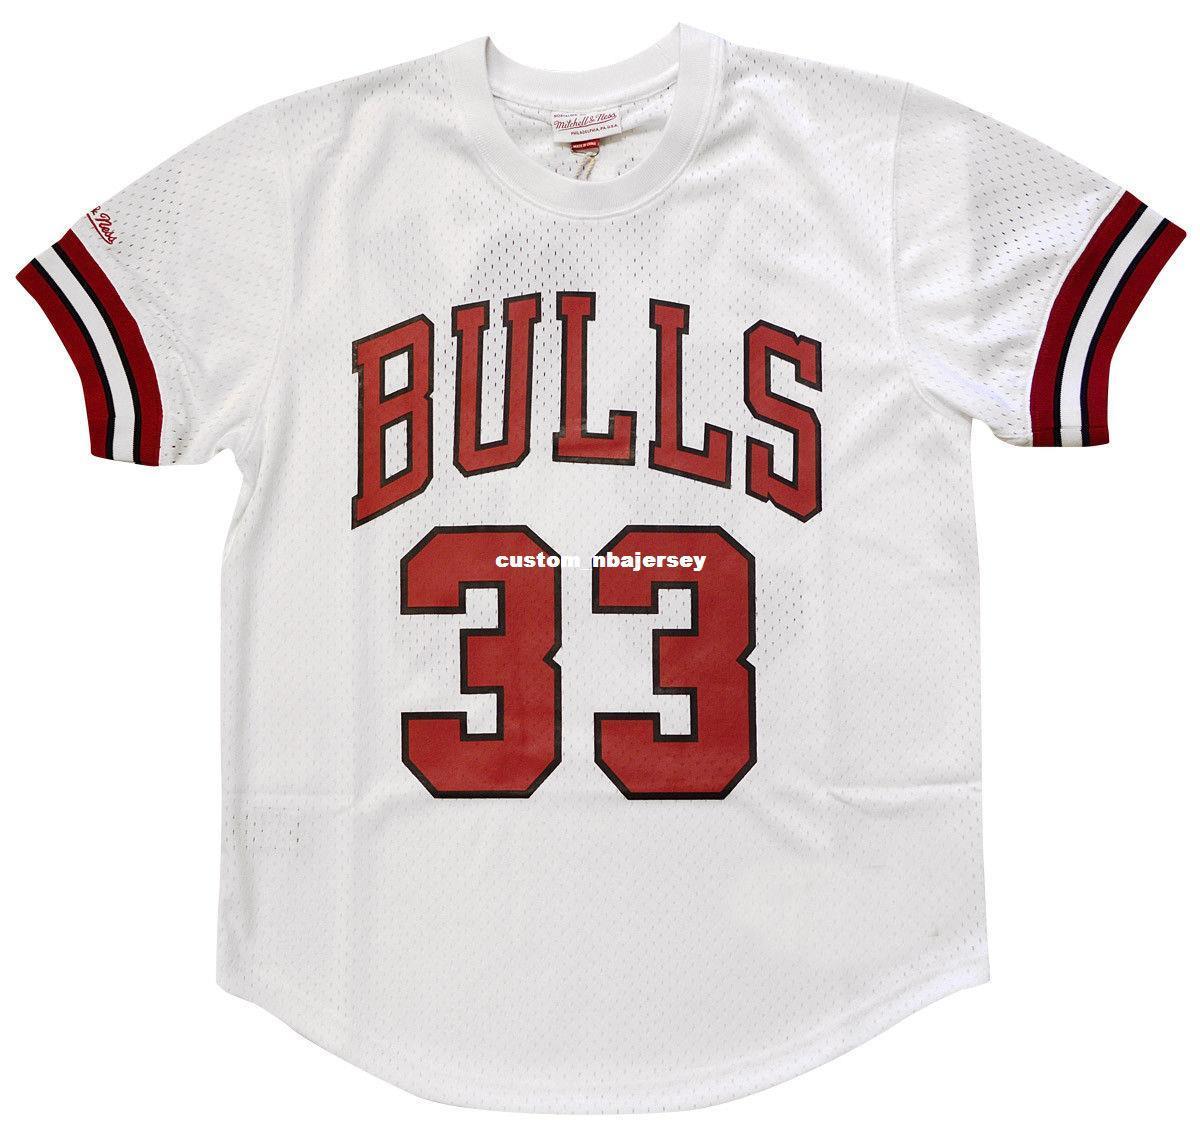 67535ceedc2 Compre Barato Personalizado Scottie Pippen Mitchell Ness Mens Mesh Jersey  Camisa Cosida Summer Tee Retro Camiseta De Baloncesto A  22.34 Del ...